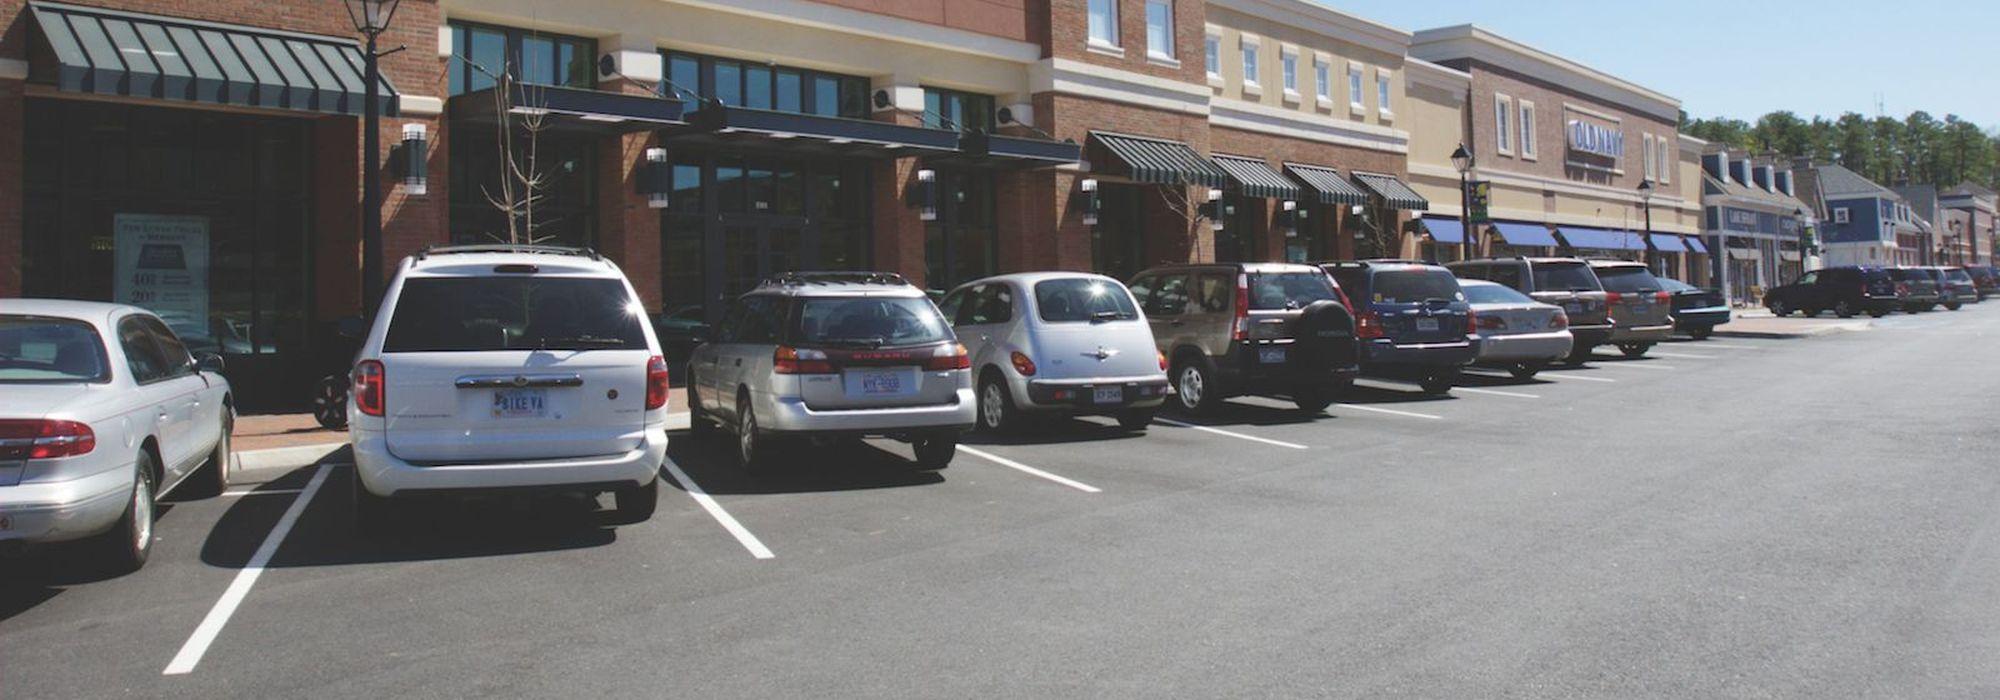 Williamsburg, Virginia – New Town Shops